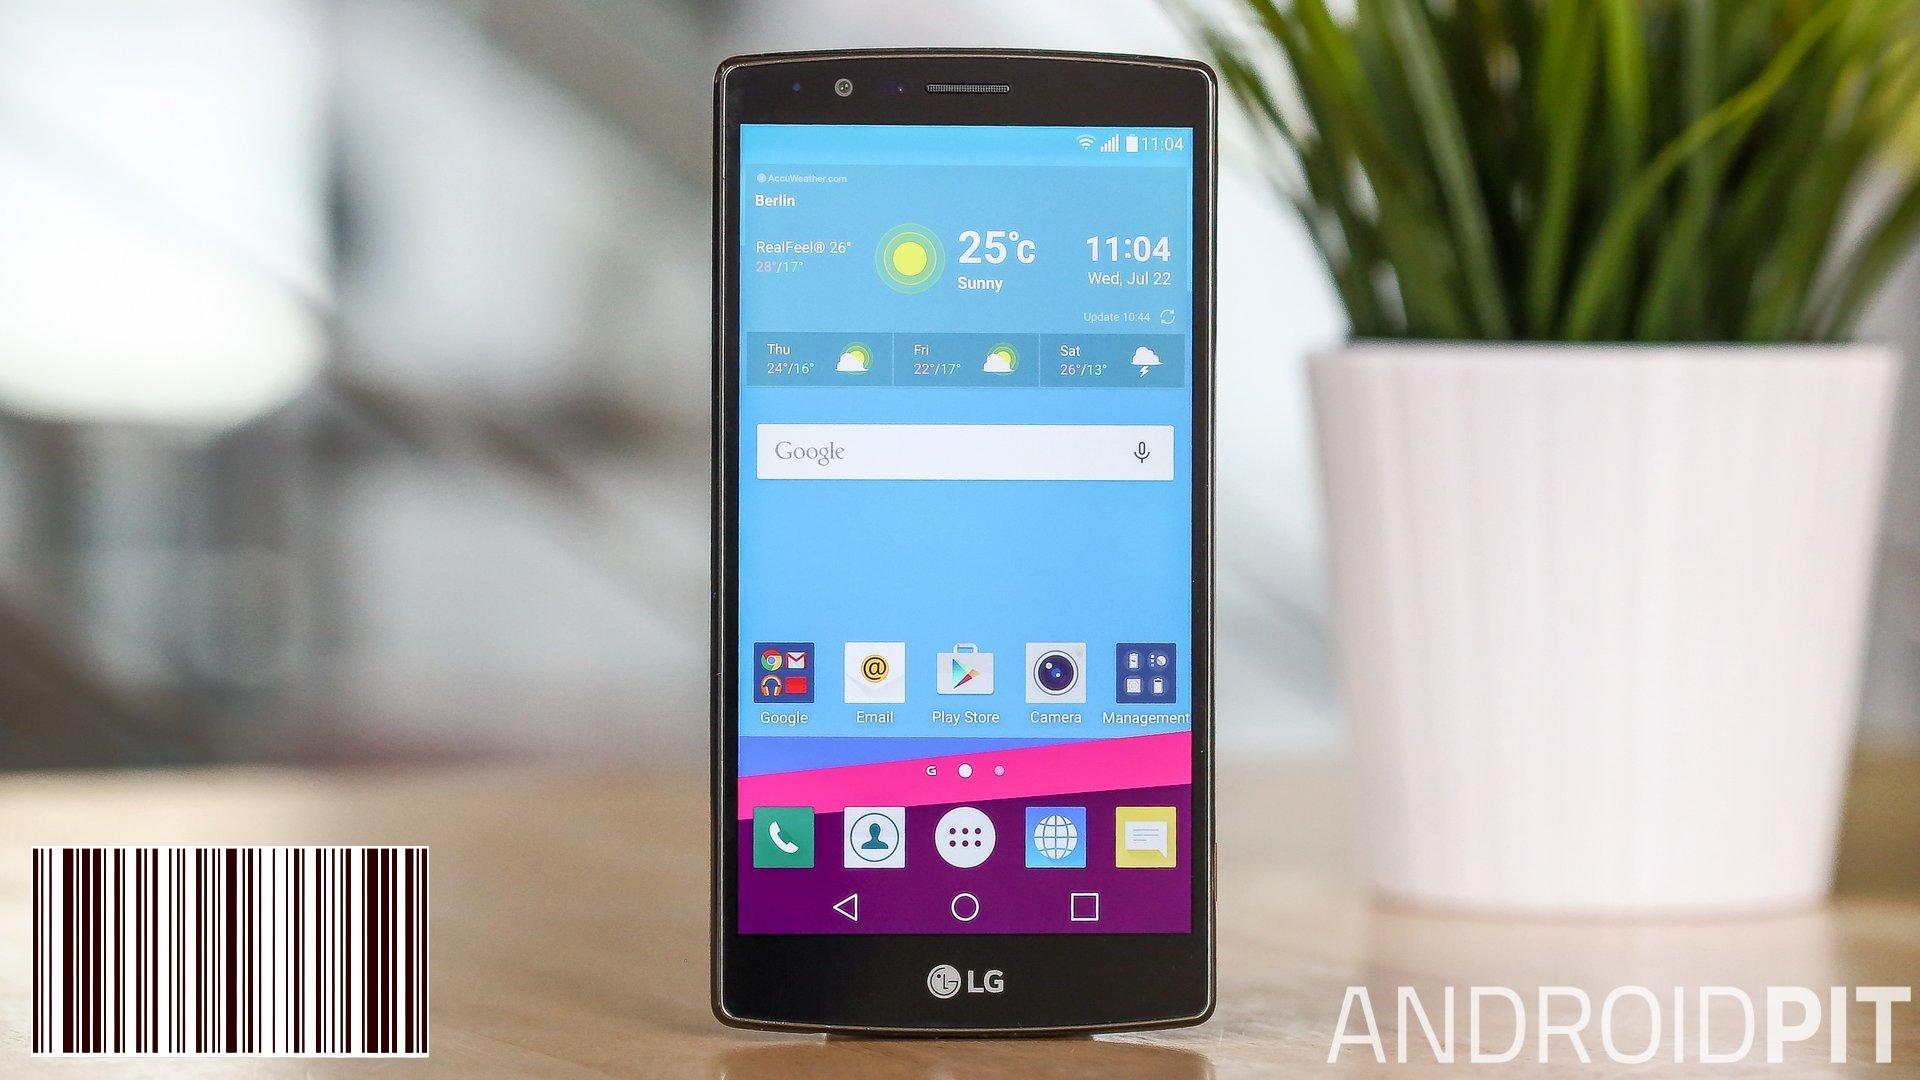 LG G4: 15 نصيحة وحيل لتحصل على أقصى استفادة من الجهاز!